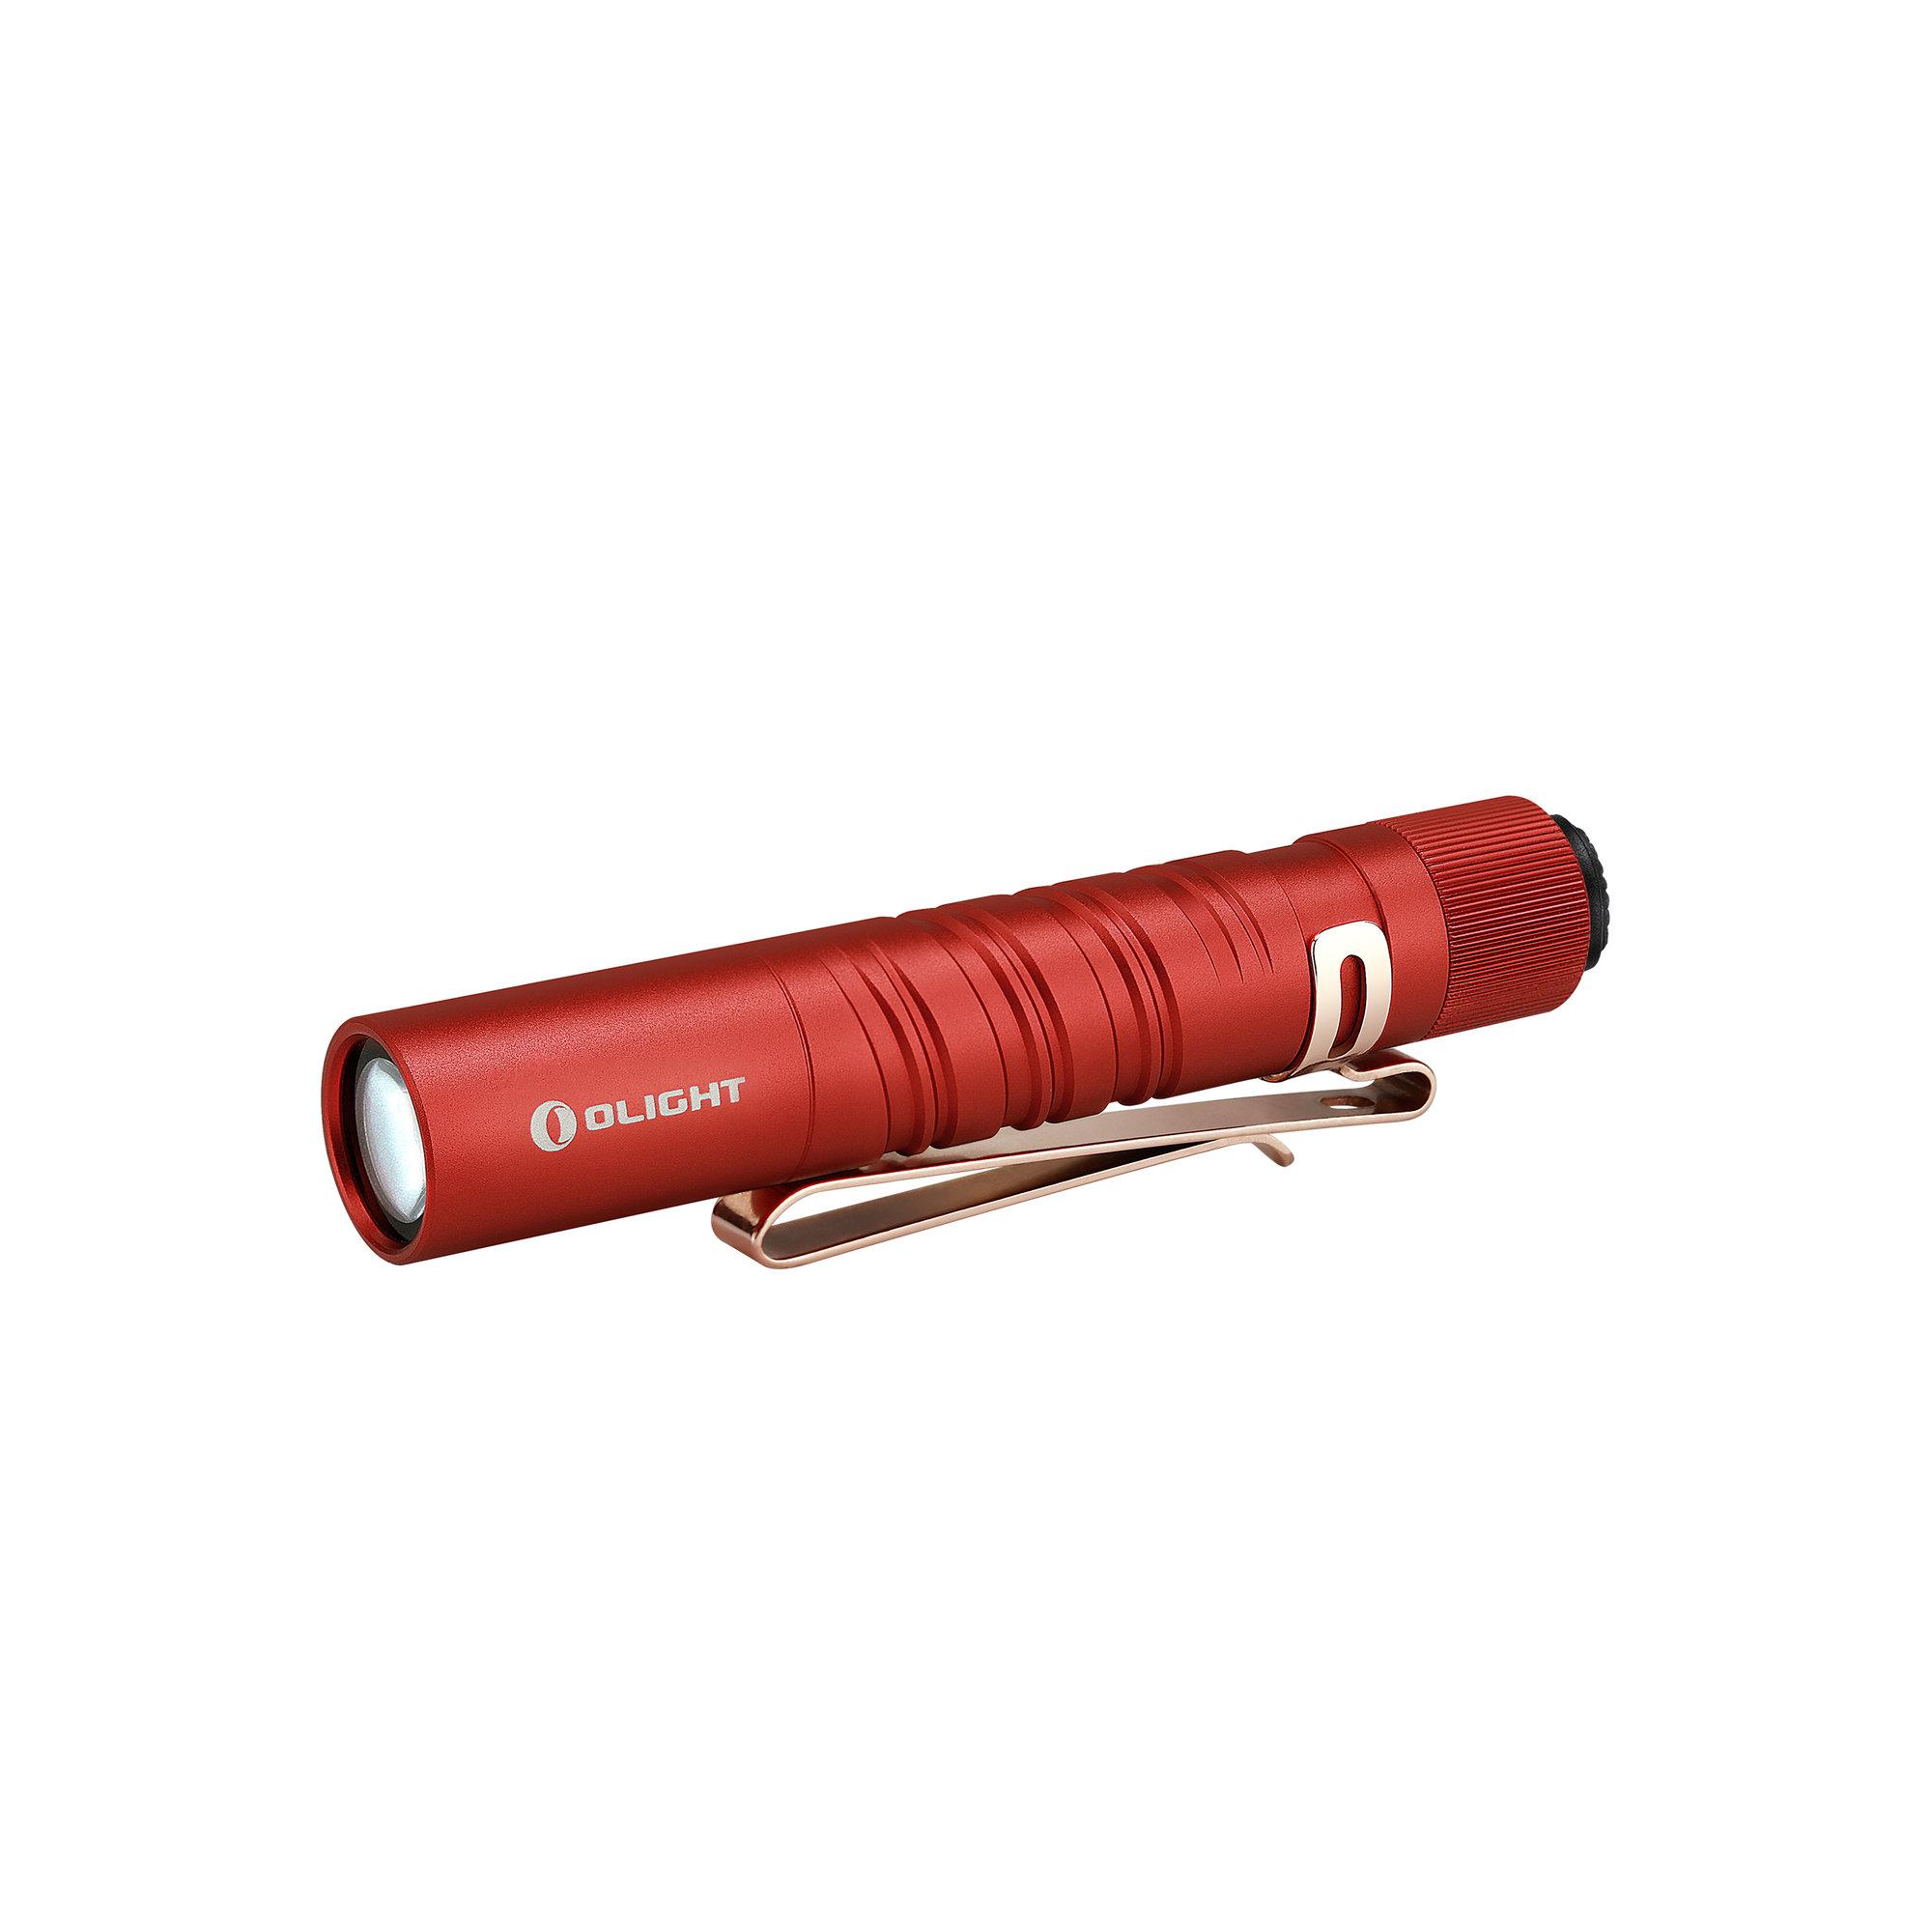 LED baterka Olight I3T EOS 180 lm - Red limitovaná edícia